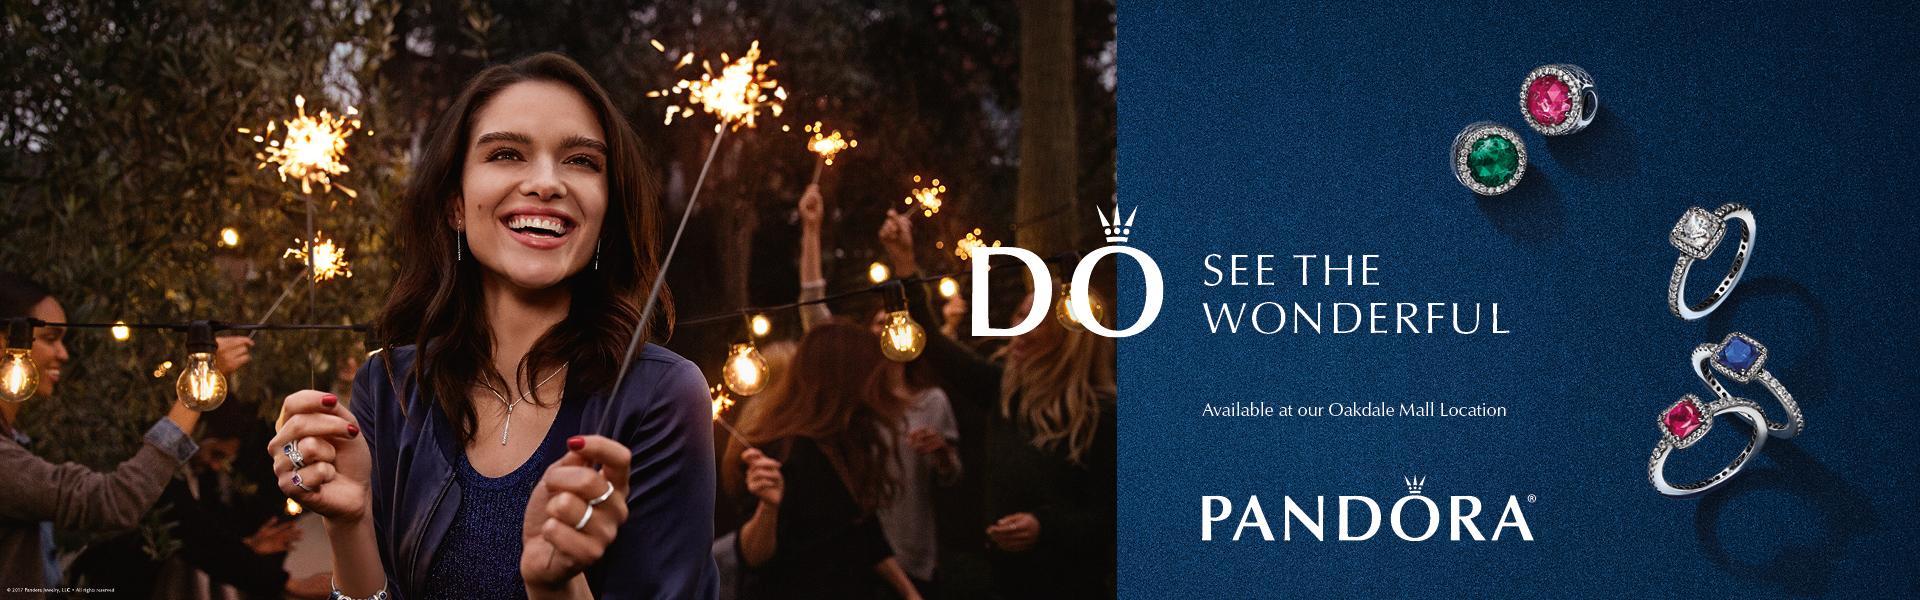 Pandora See the Wonderful!